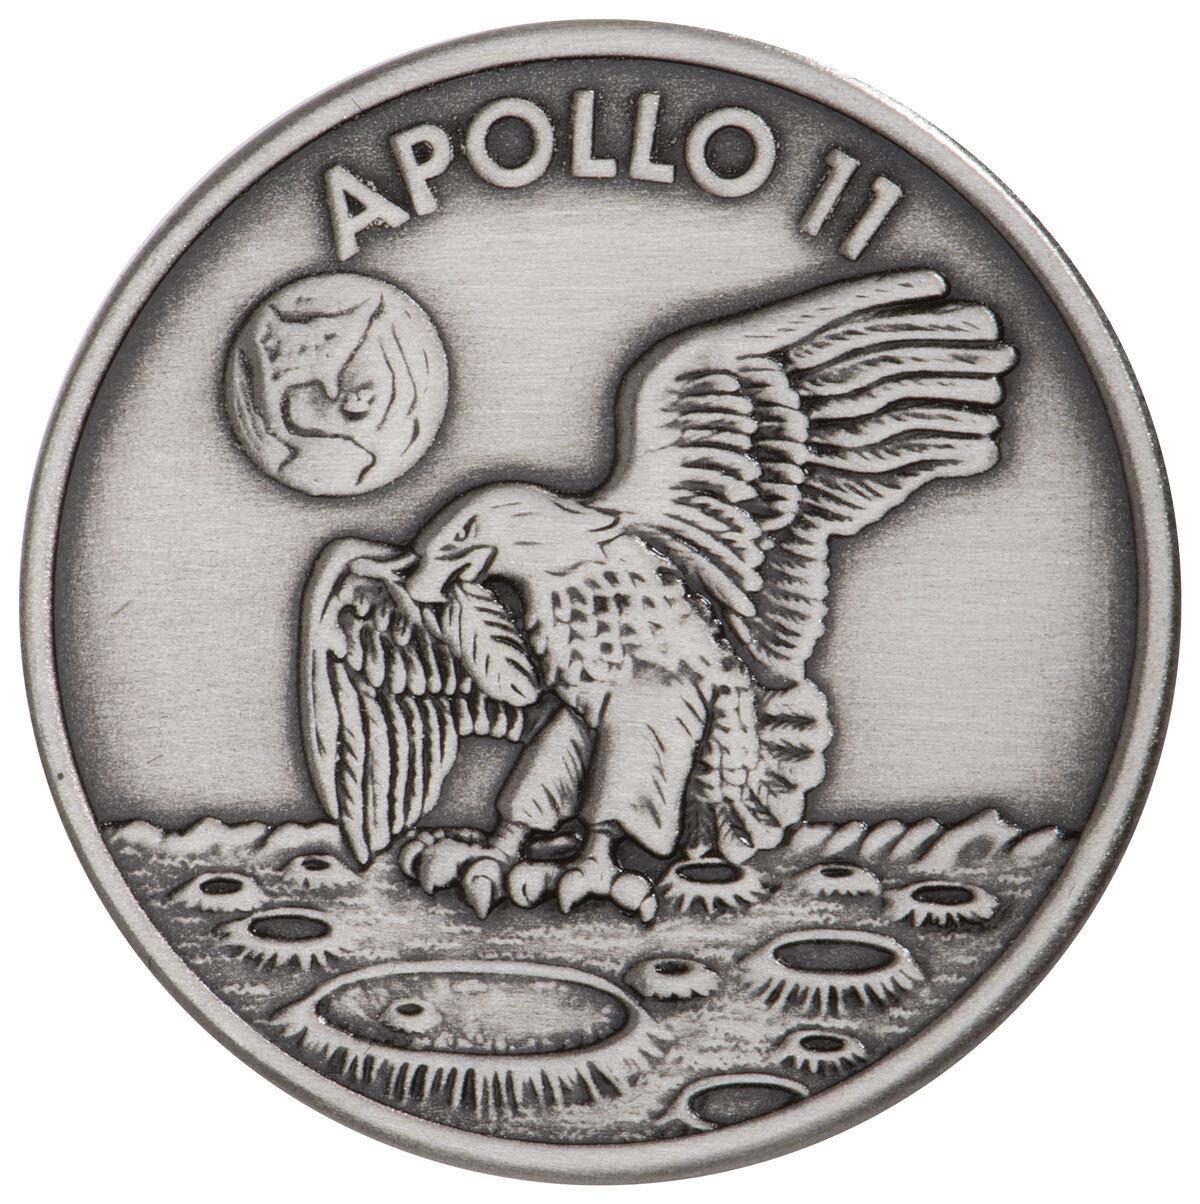 1969-2019 Apollo 11 Robbins Medals 1 oz Silver-Plated Antiqued Medal BU SKU54913